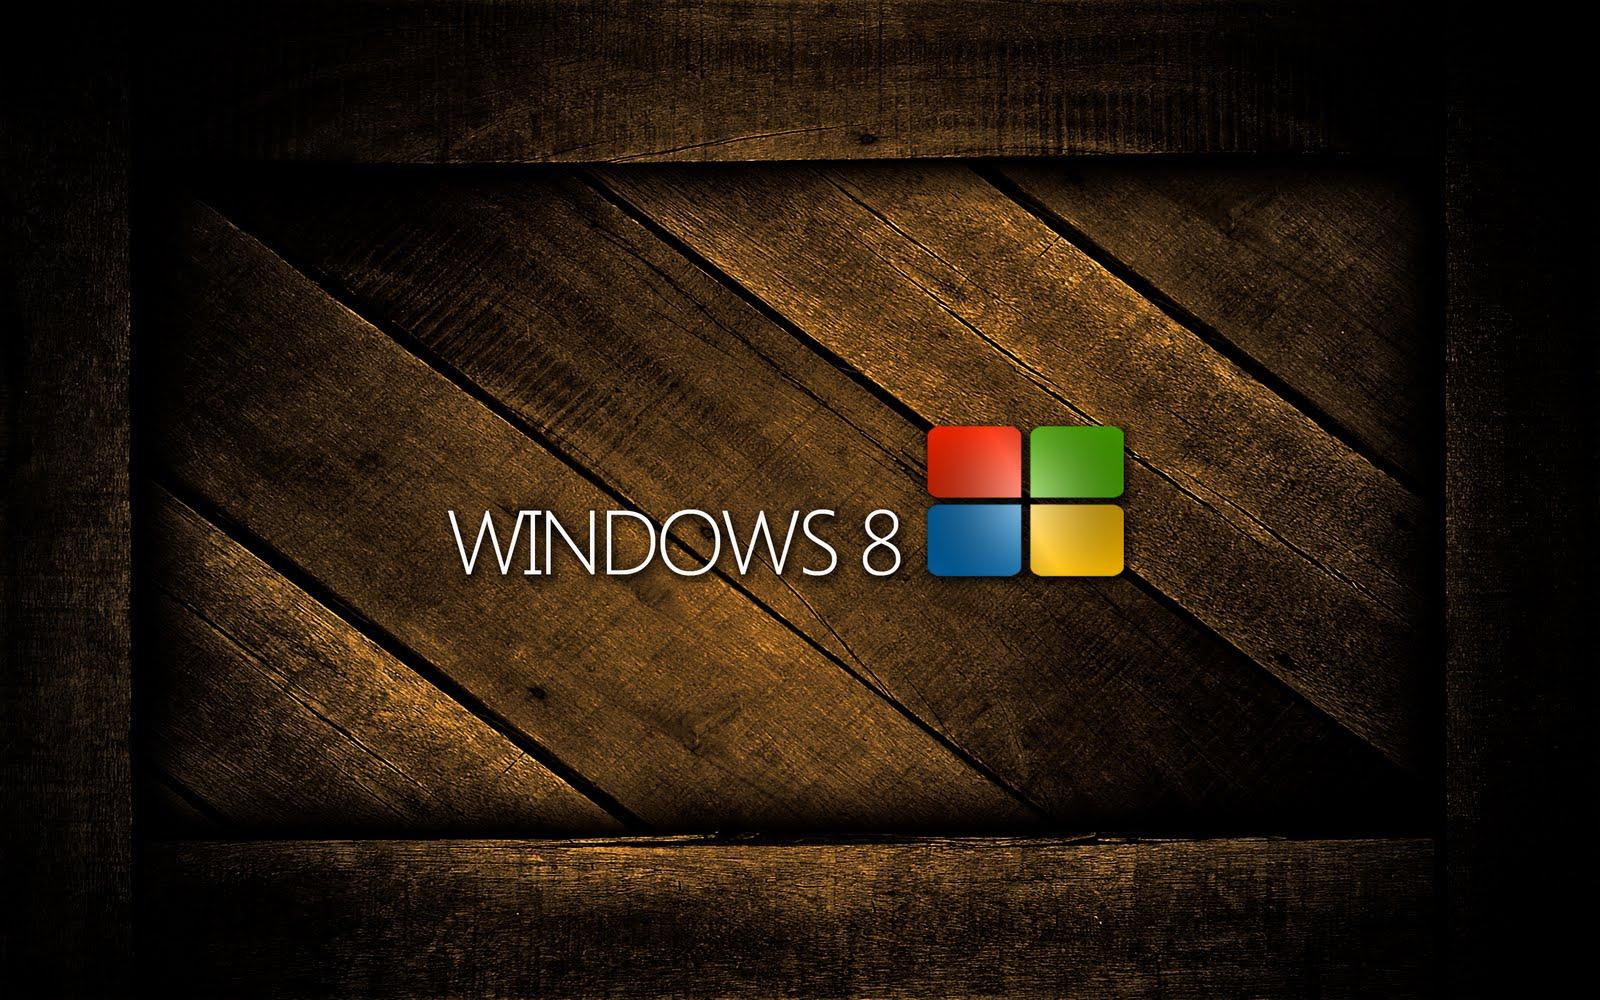 http://4.bp.blogspot.com/-_FuAOtmpiQk/UKdo_jhSxBI/AAAAAAAAAgk/lJjQ8xVkxKA/s1600/windows-8-wallpaper-official.jpg